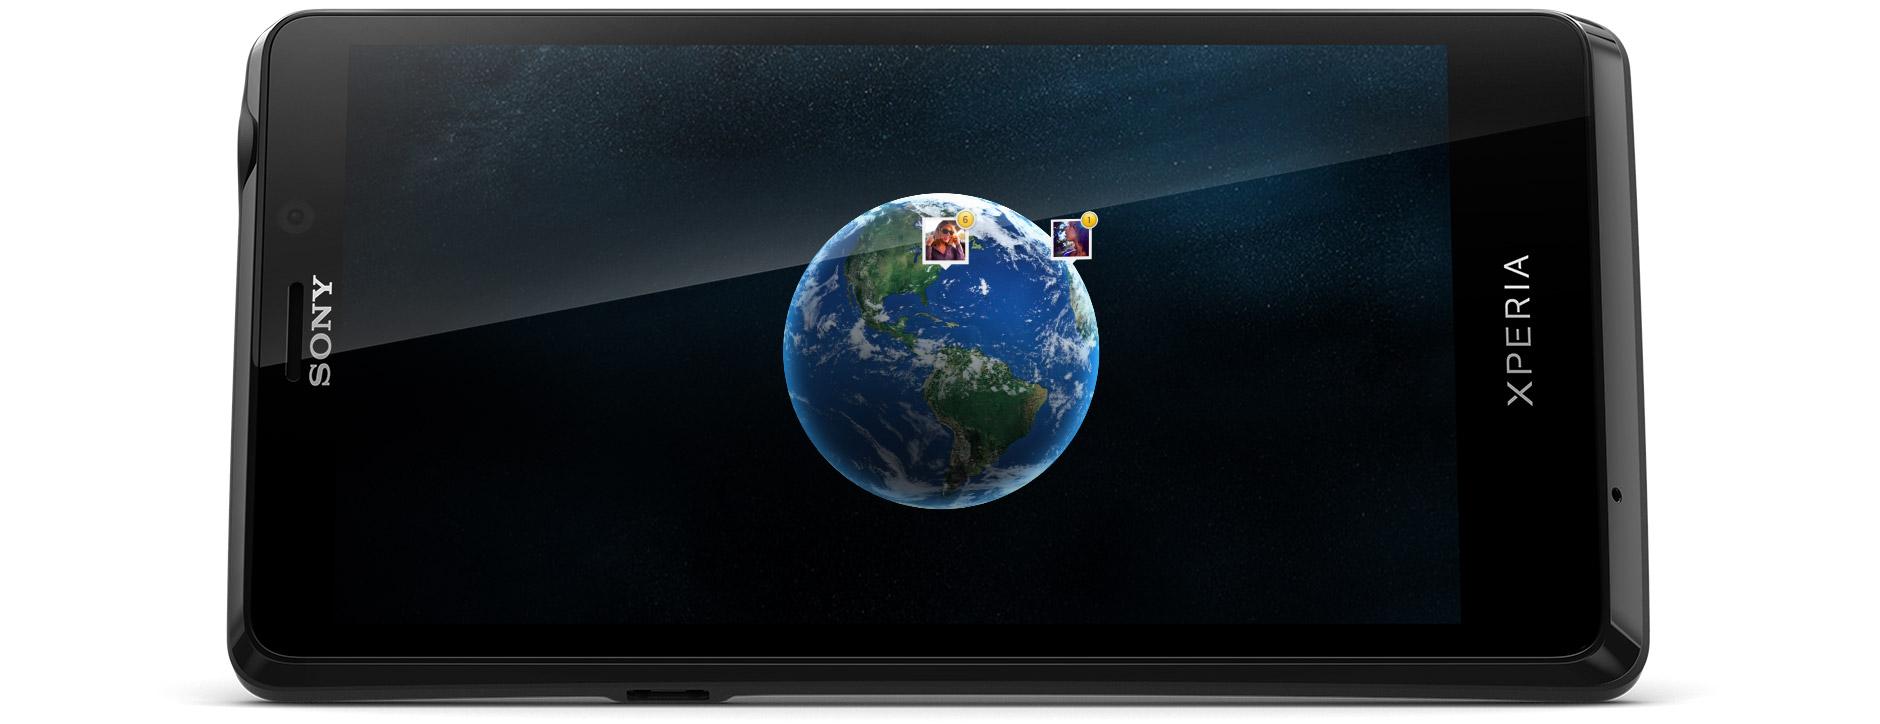 xperia-t-overview-remember-1880x724-163ec48f4310aa0692d1e7fd1952b165.jpg